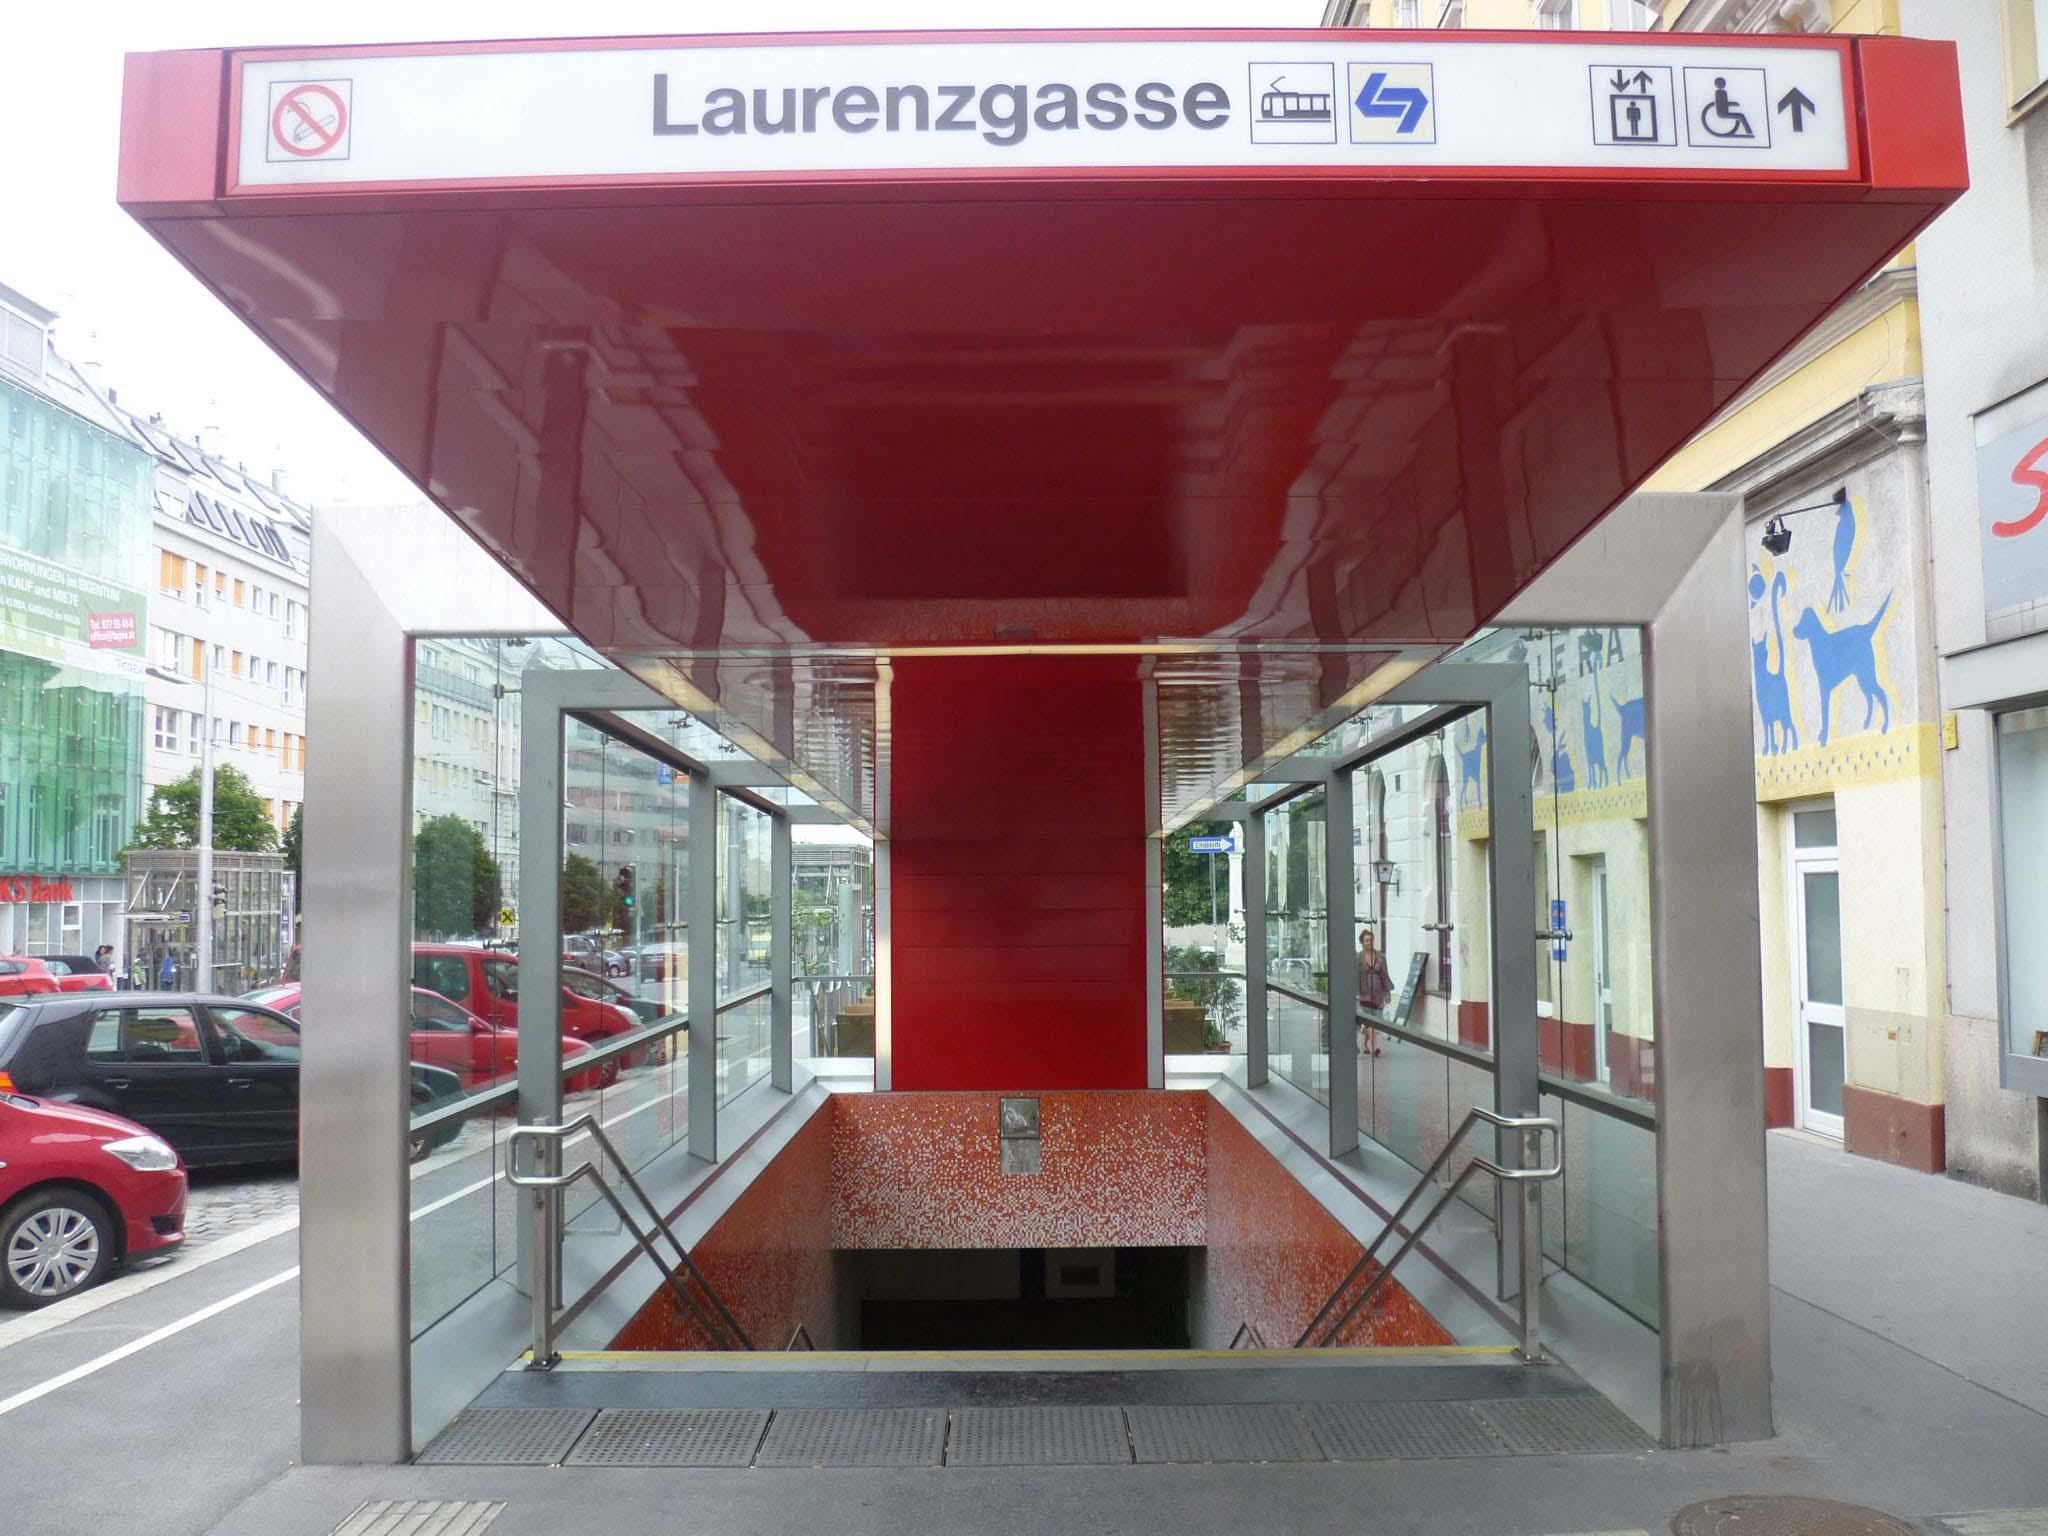 Laurenzgasse Station in Wien, Austria